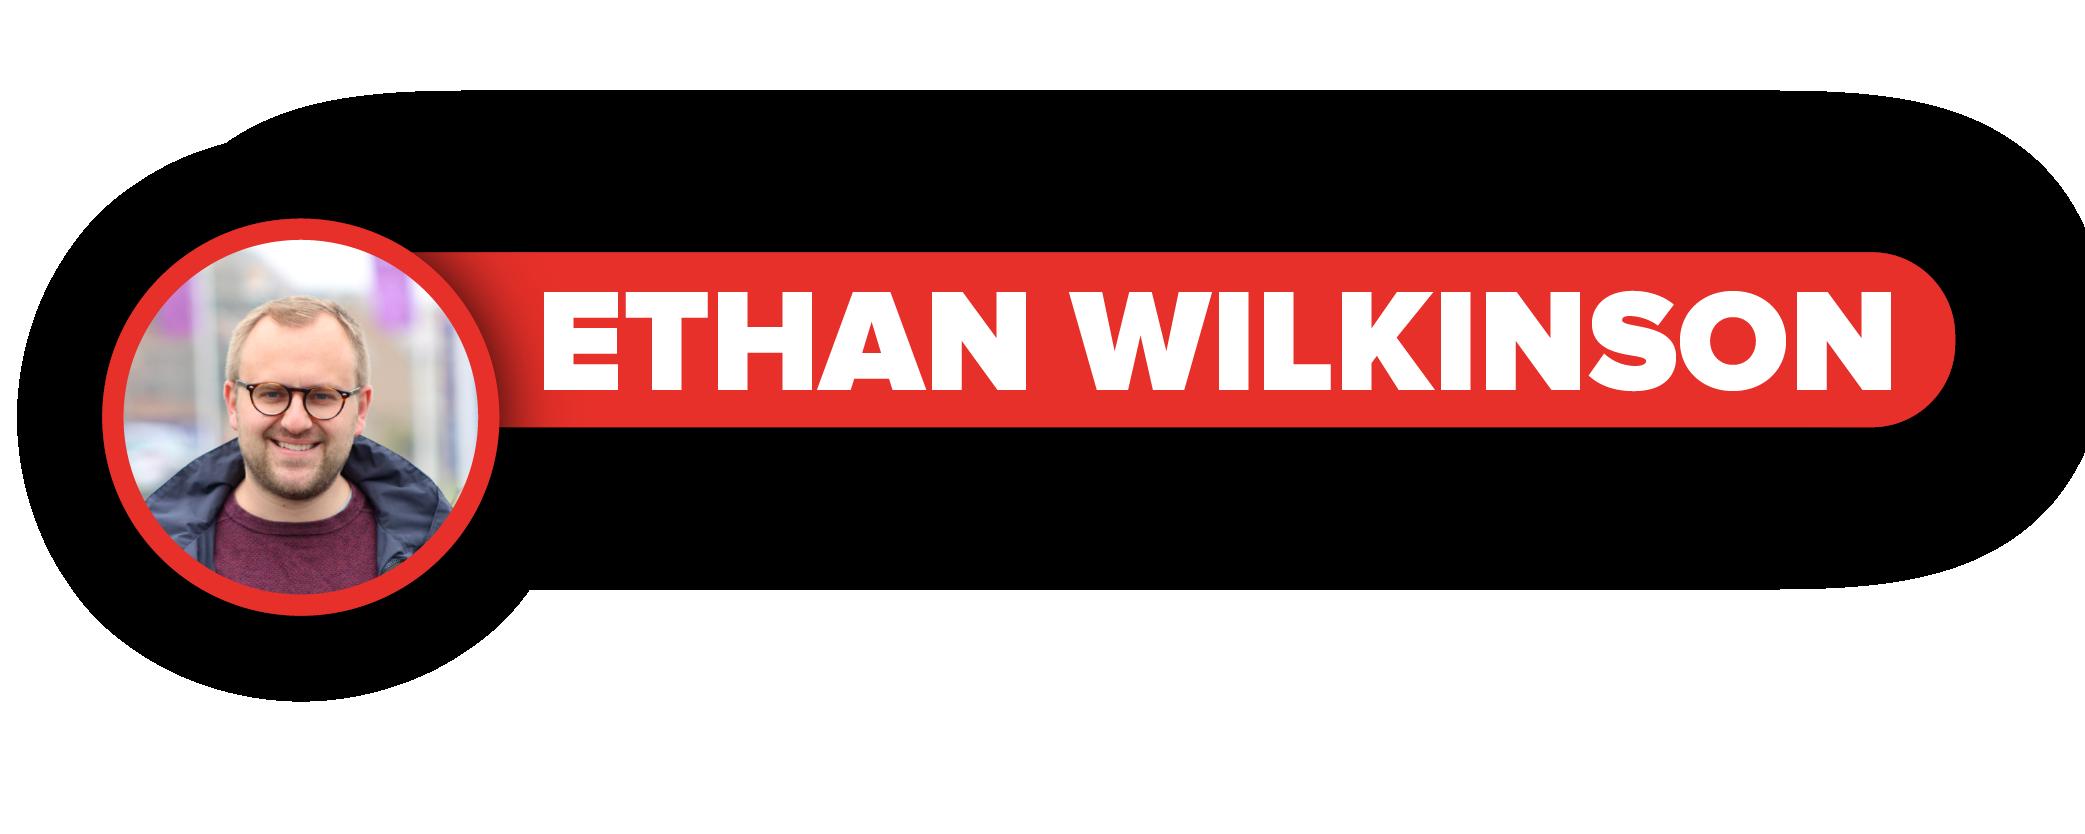 Ethan Wilkinson